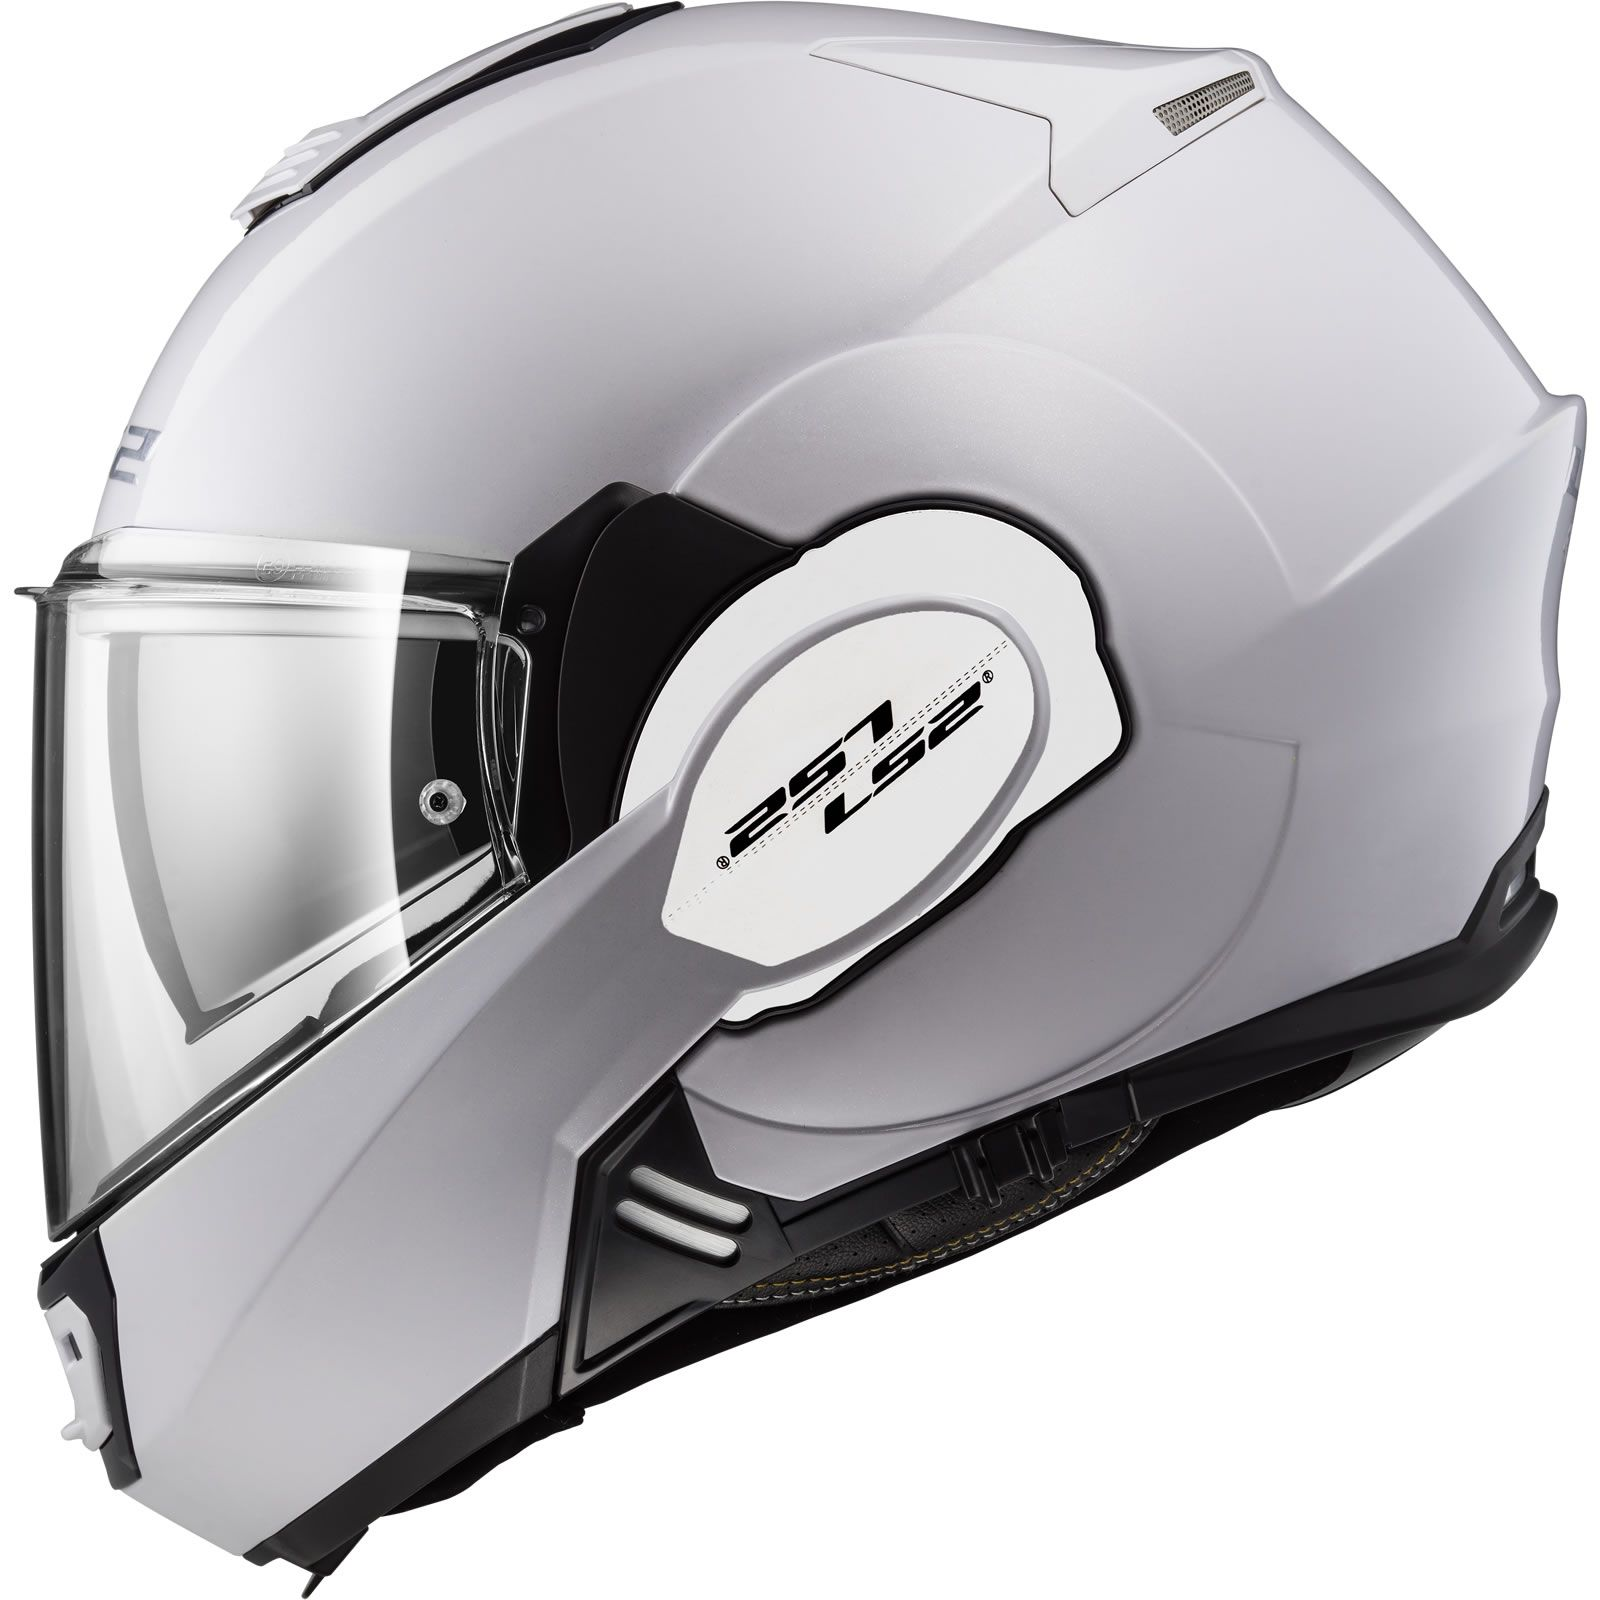 Capacete LS2 FF399 Valiant Branco C/ VISEIRA SOLAR Articulado  - Nova Centro Boutique Roupas para Motociclistas